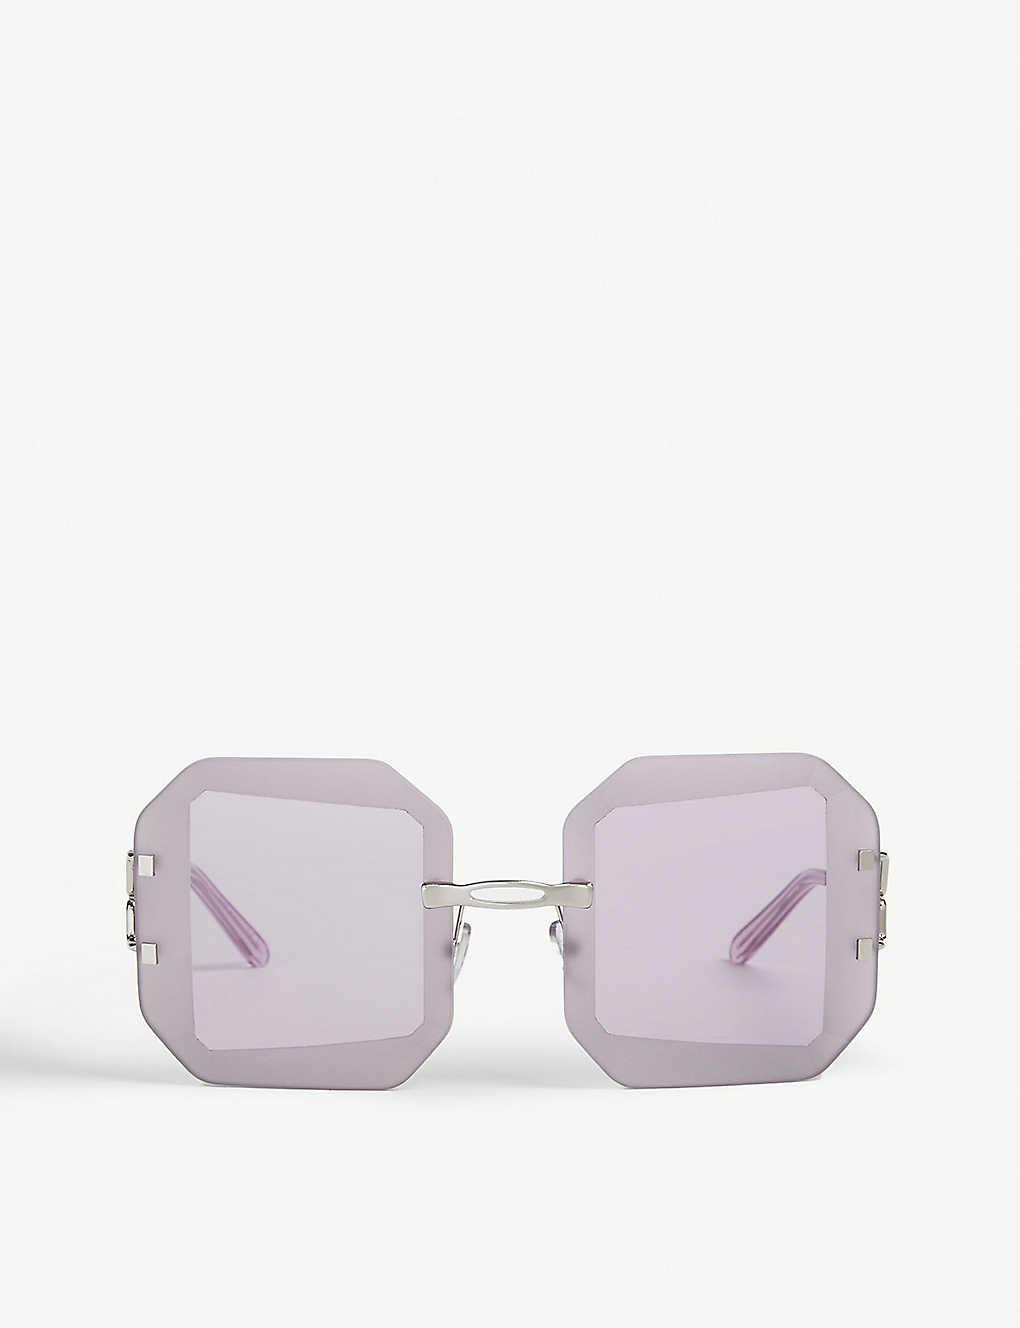 Marni Sunglasses Octagon-shaped sunglasses